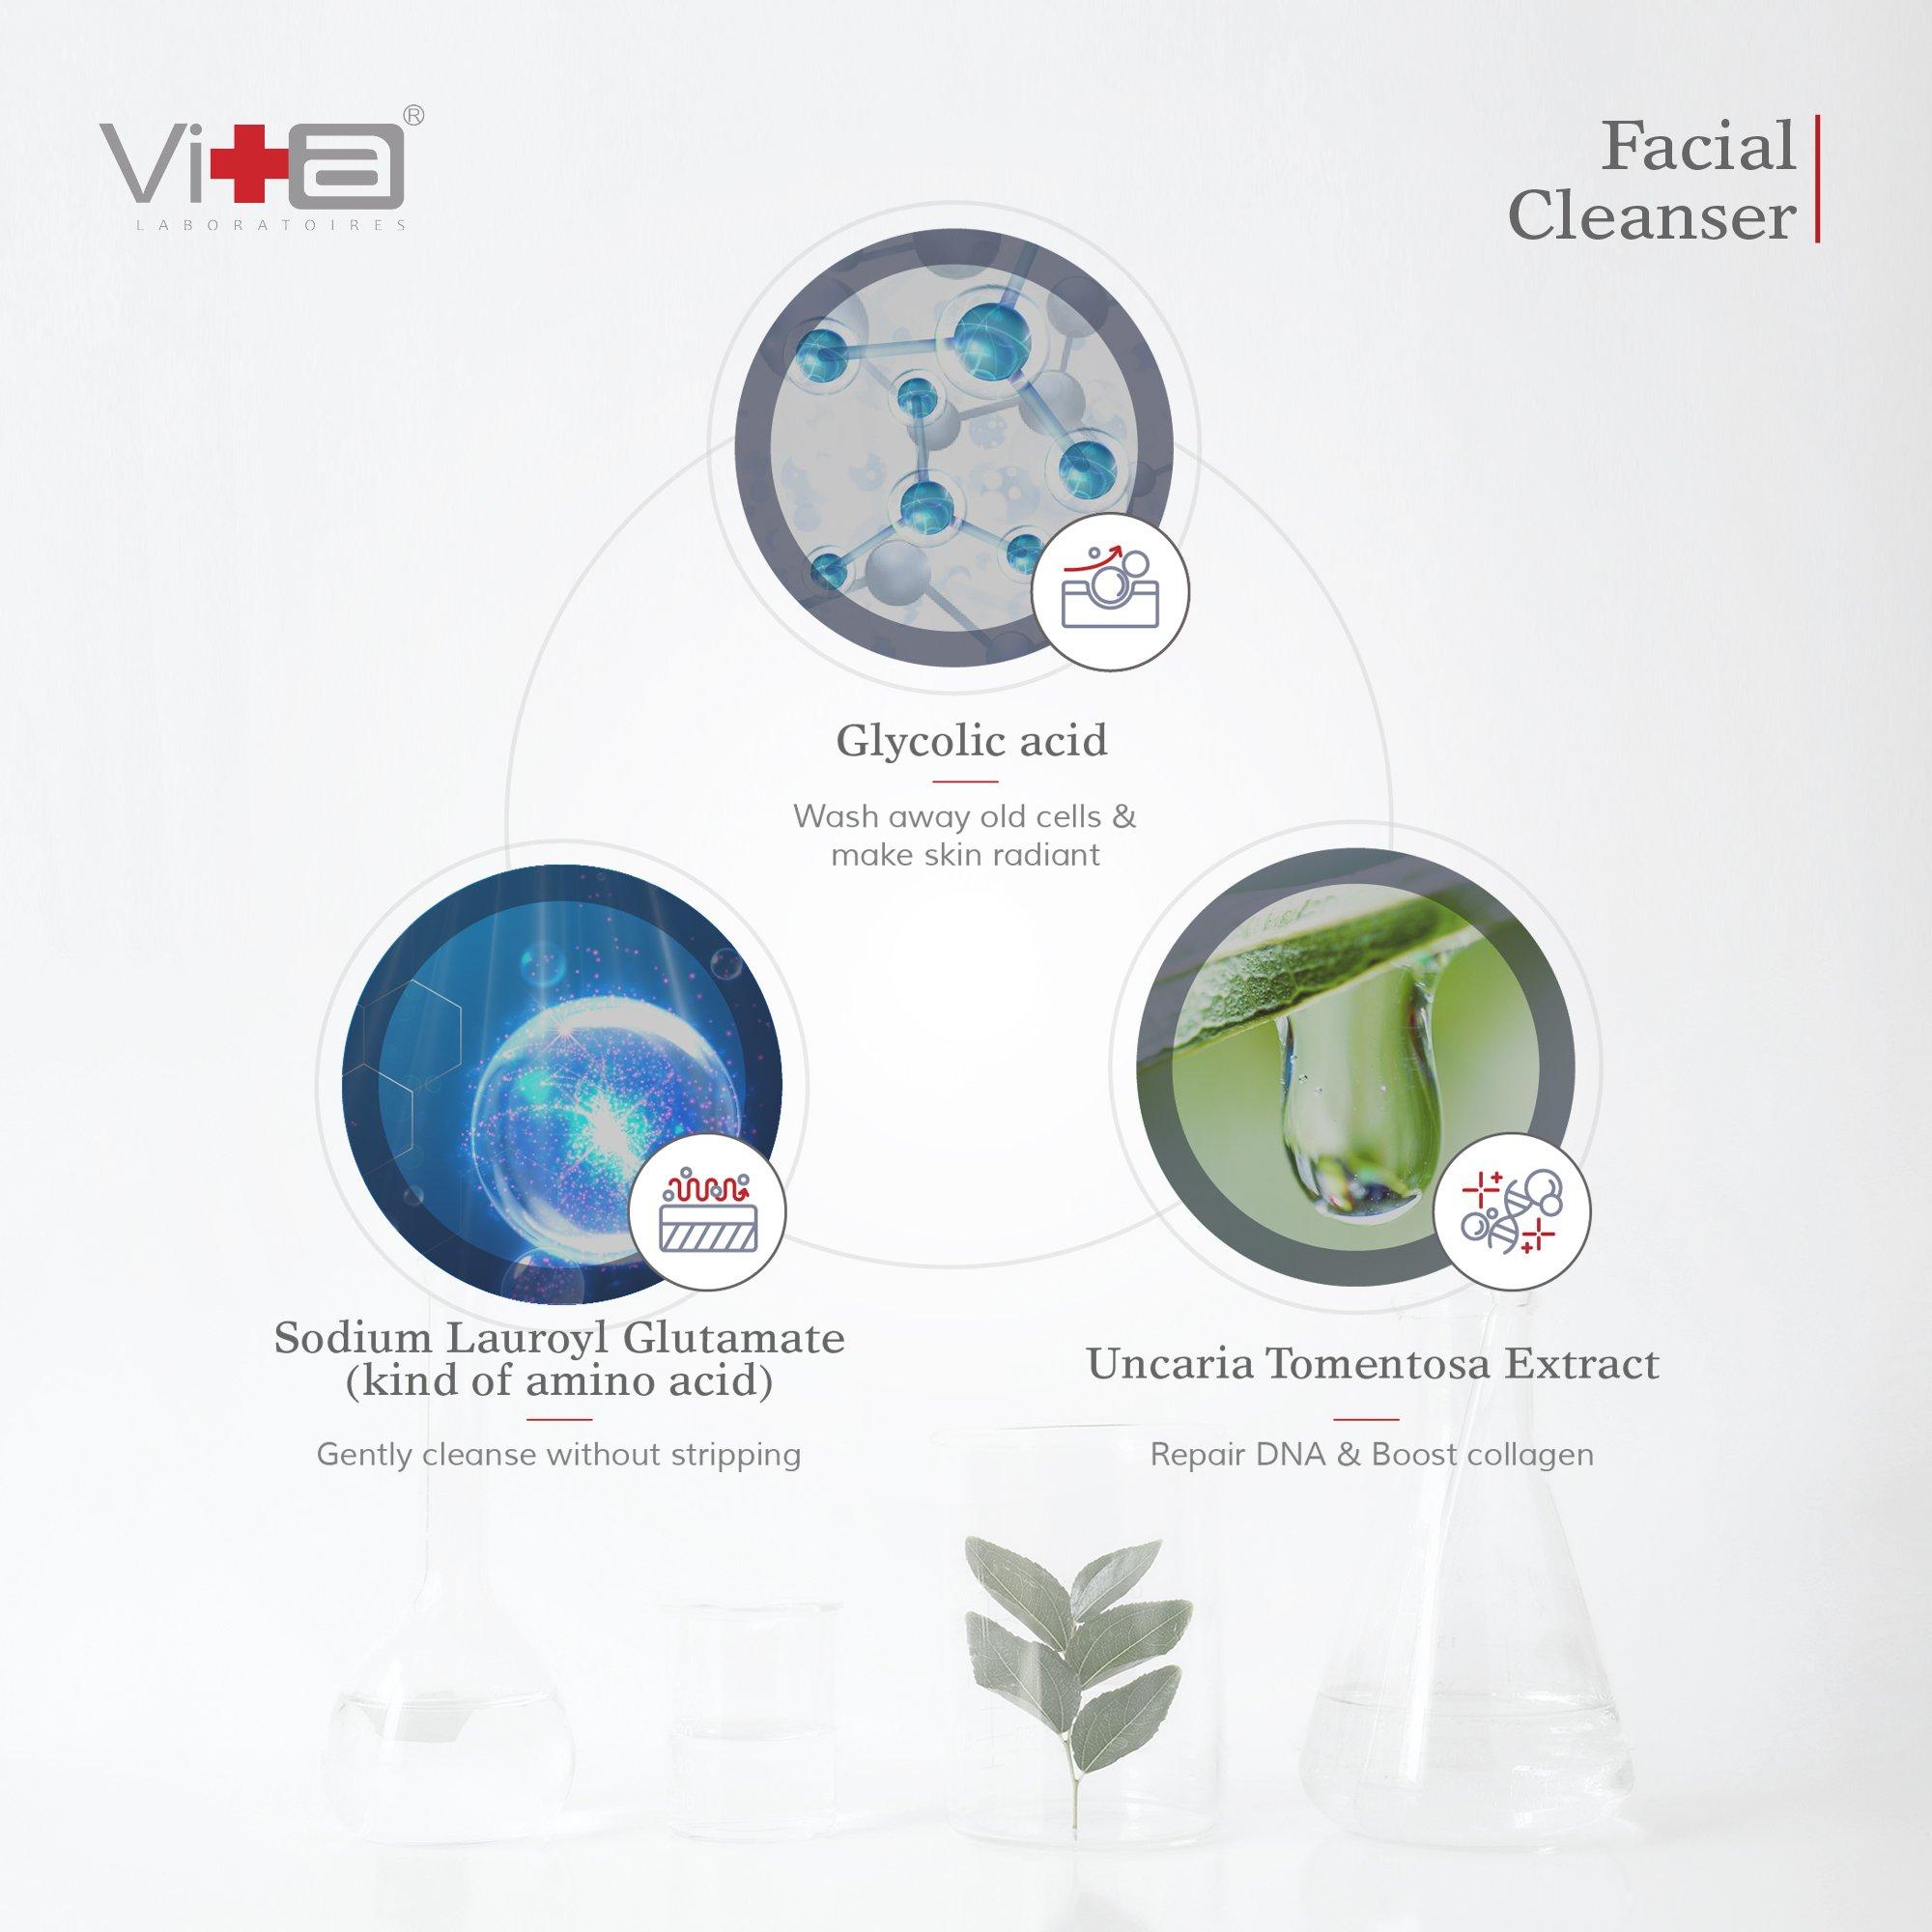 Swissvita Acne Facial Cleanser with Glycolic Acid & Amino Acid- Moisturizing Face Wash for Blackheads & Acne 3.5o.z./100g